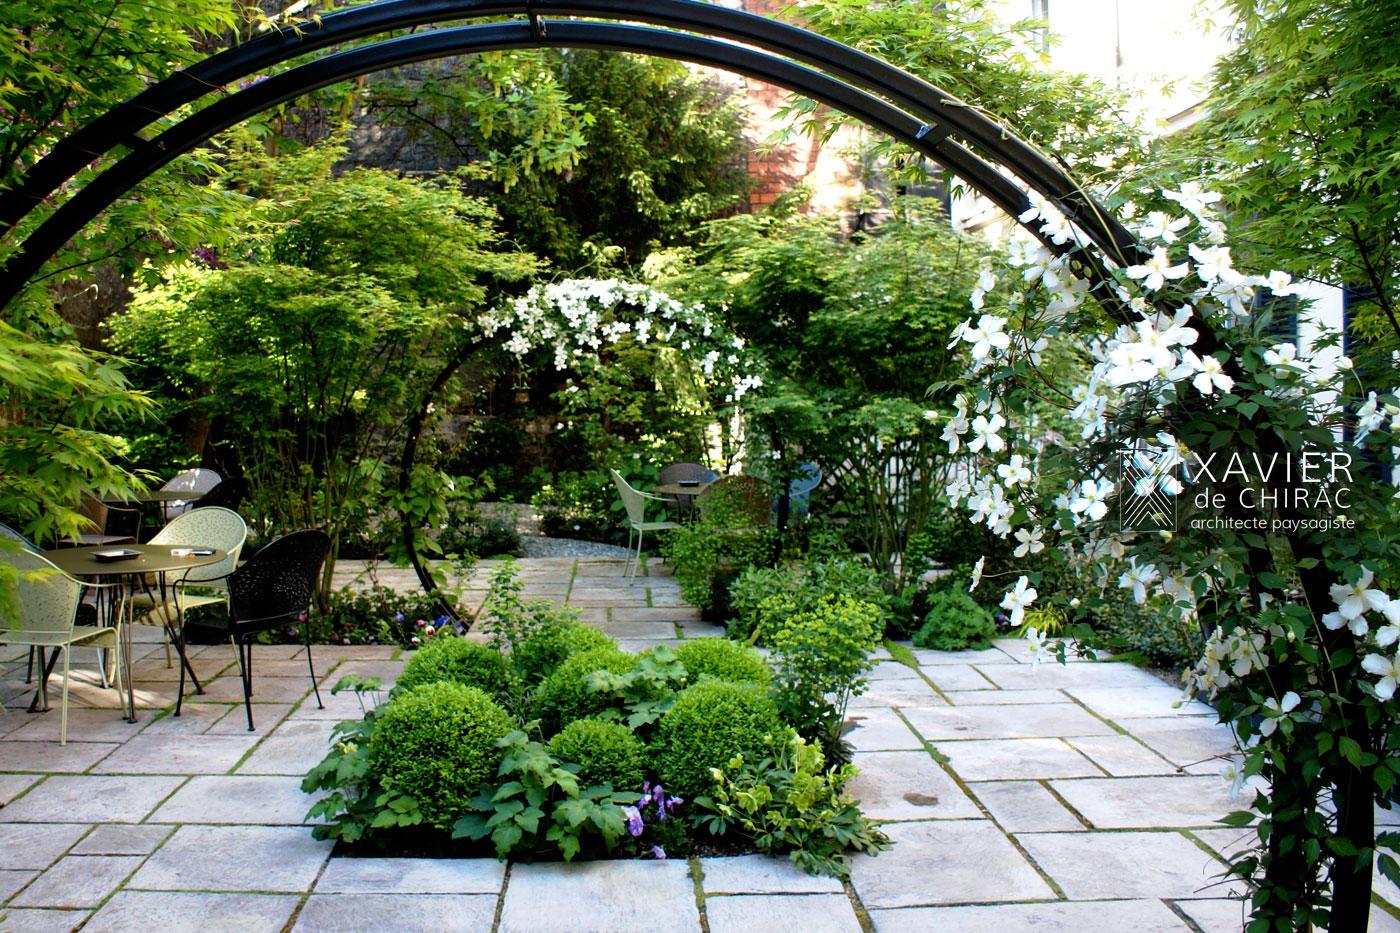 Jardin paysager - Vert - XAVIER DE CHIRAC   Decofinder